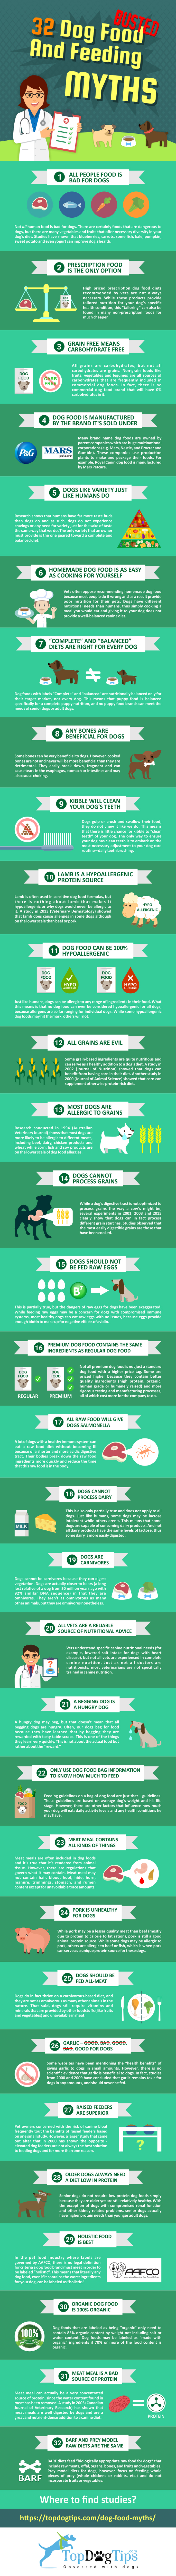 Dog-Food-Myths